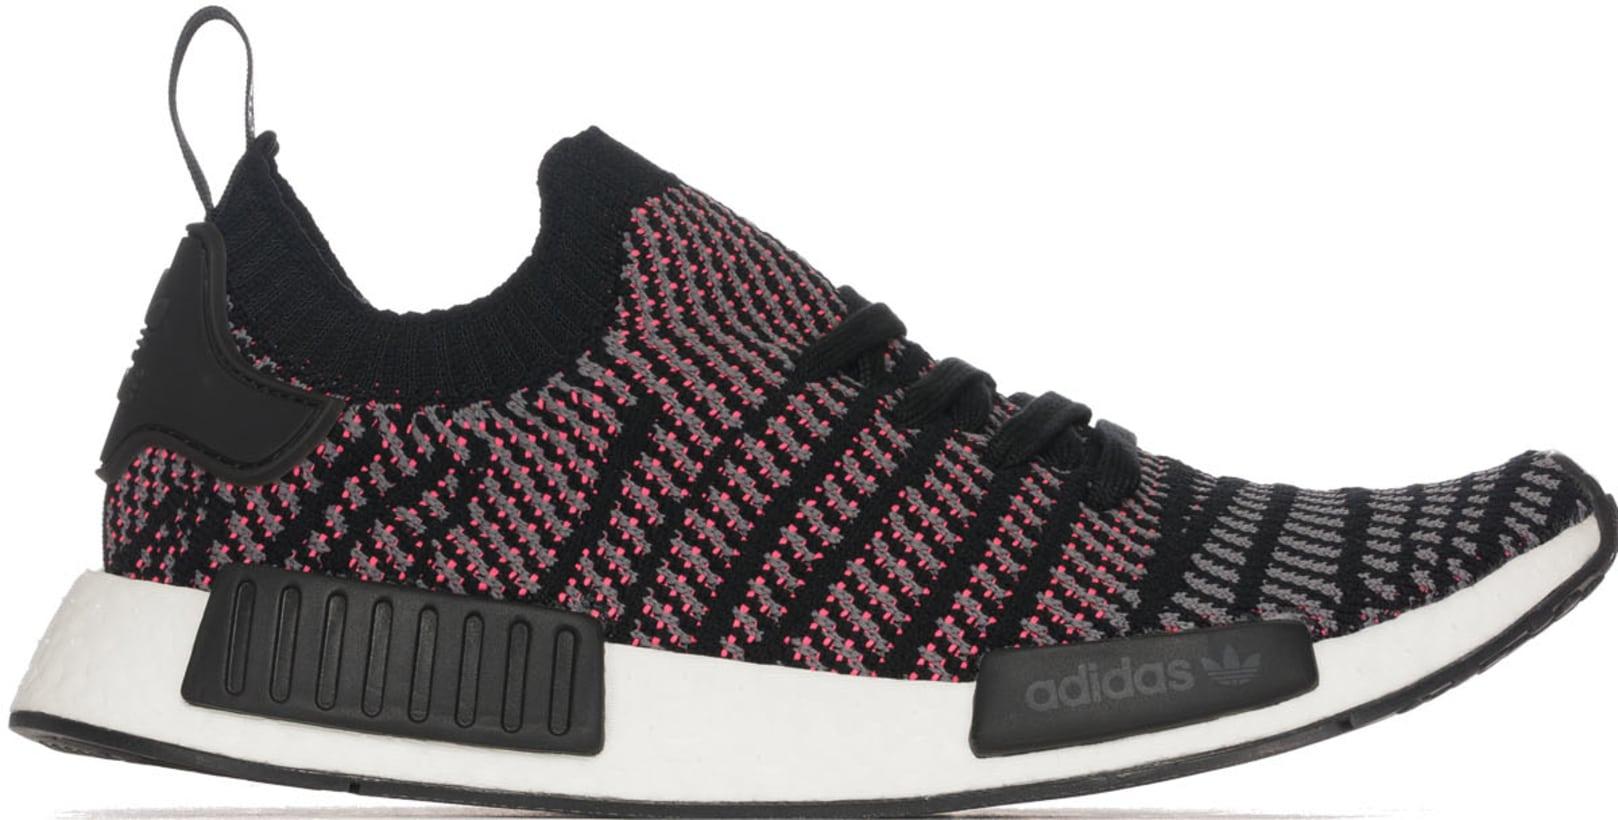 b6df58e2dd3fb adidas Originals  NMD R1 STLT Primeknit - Core Black Grey Solar Pink ...